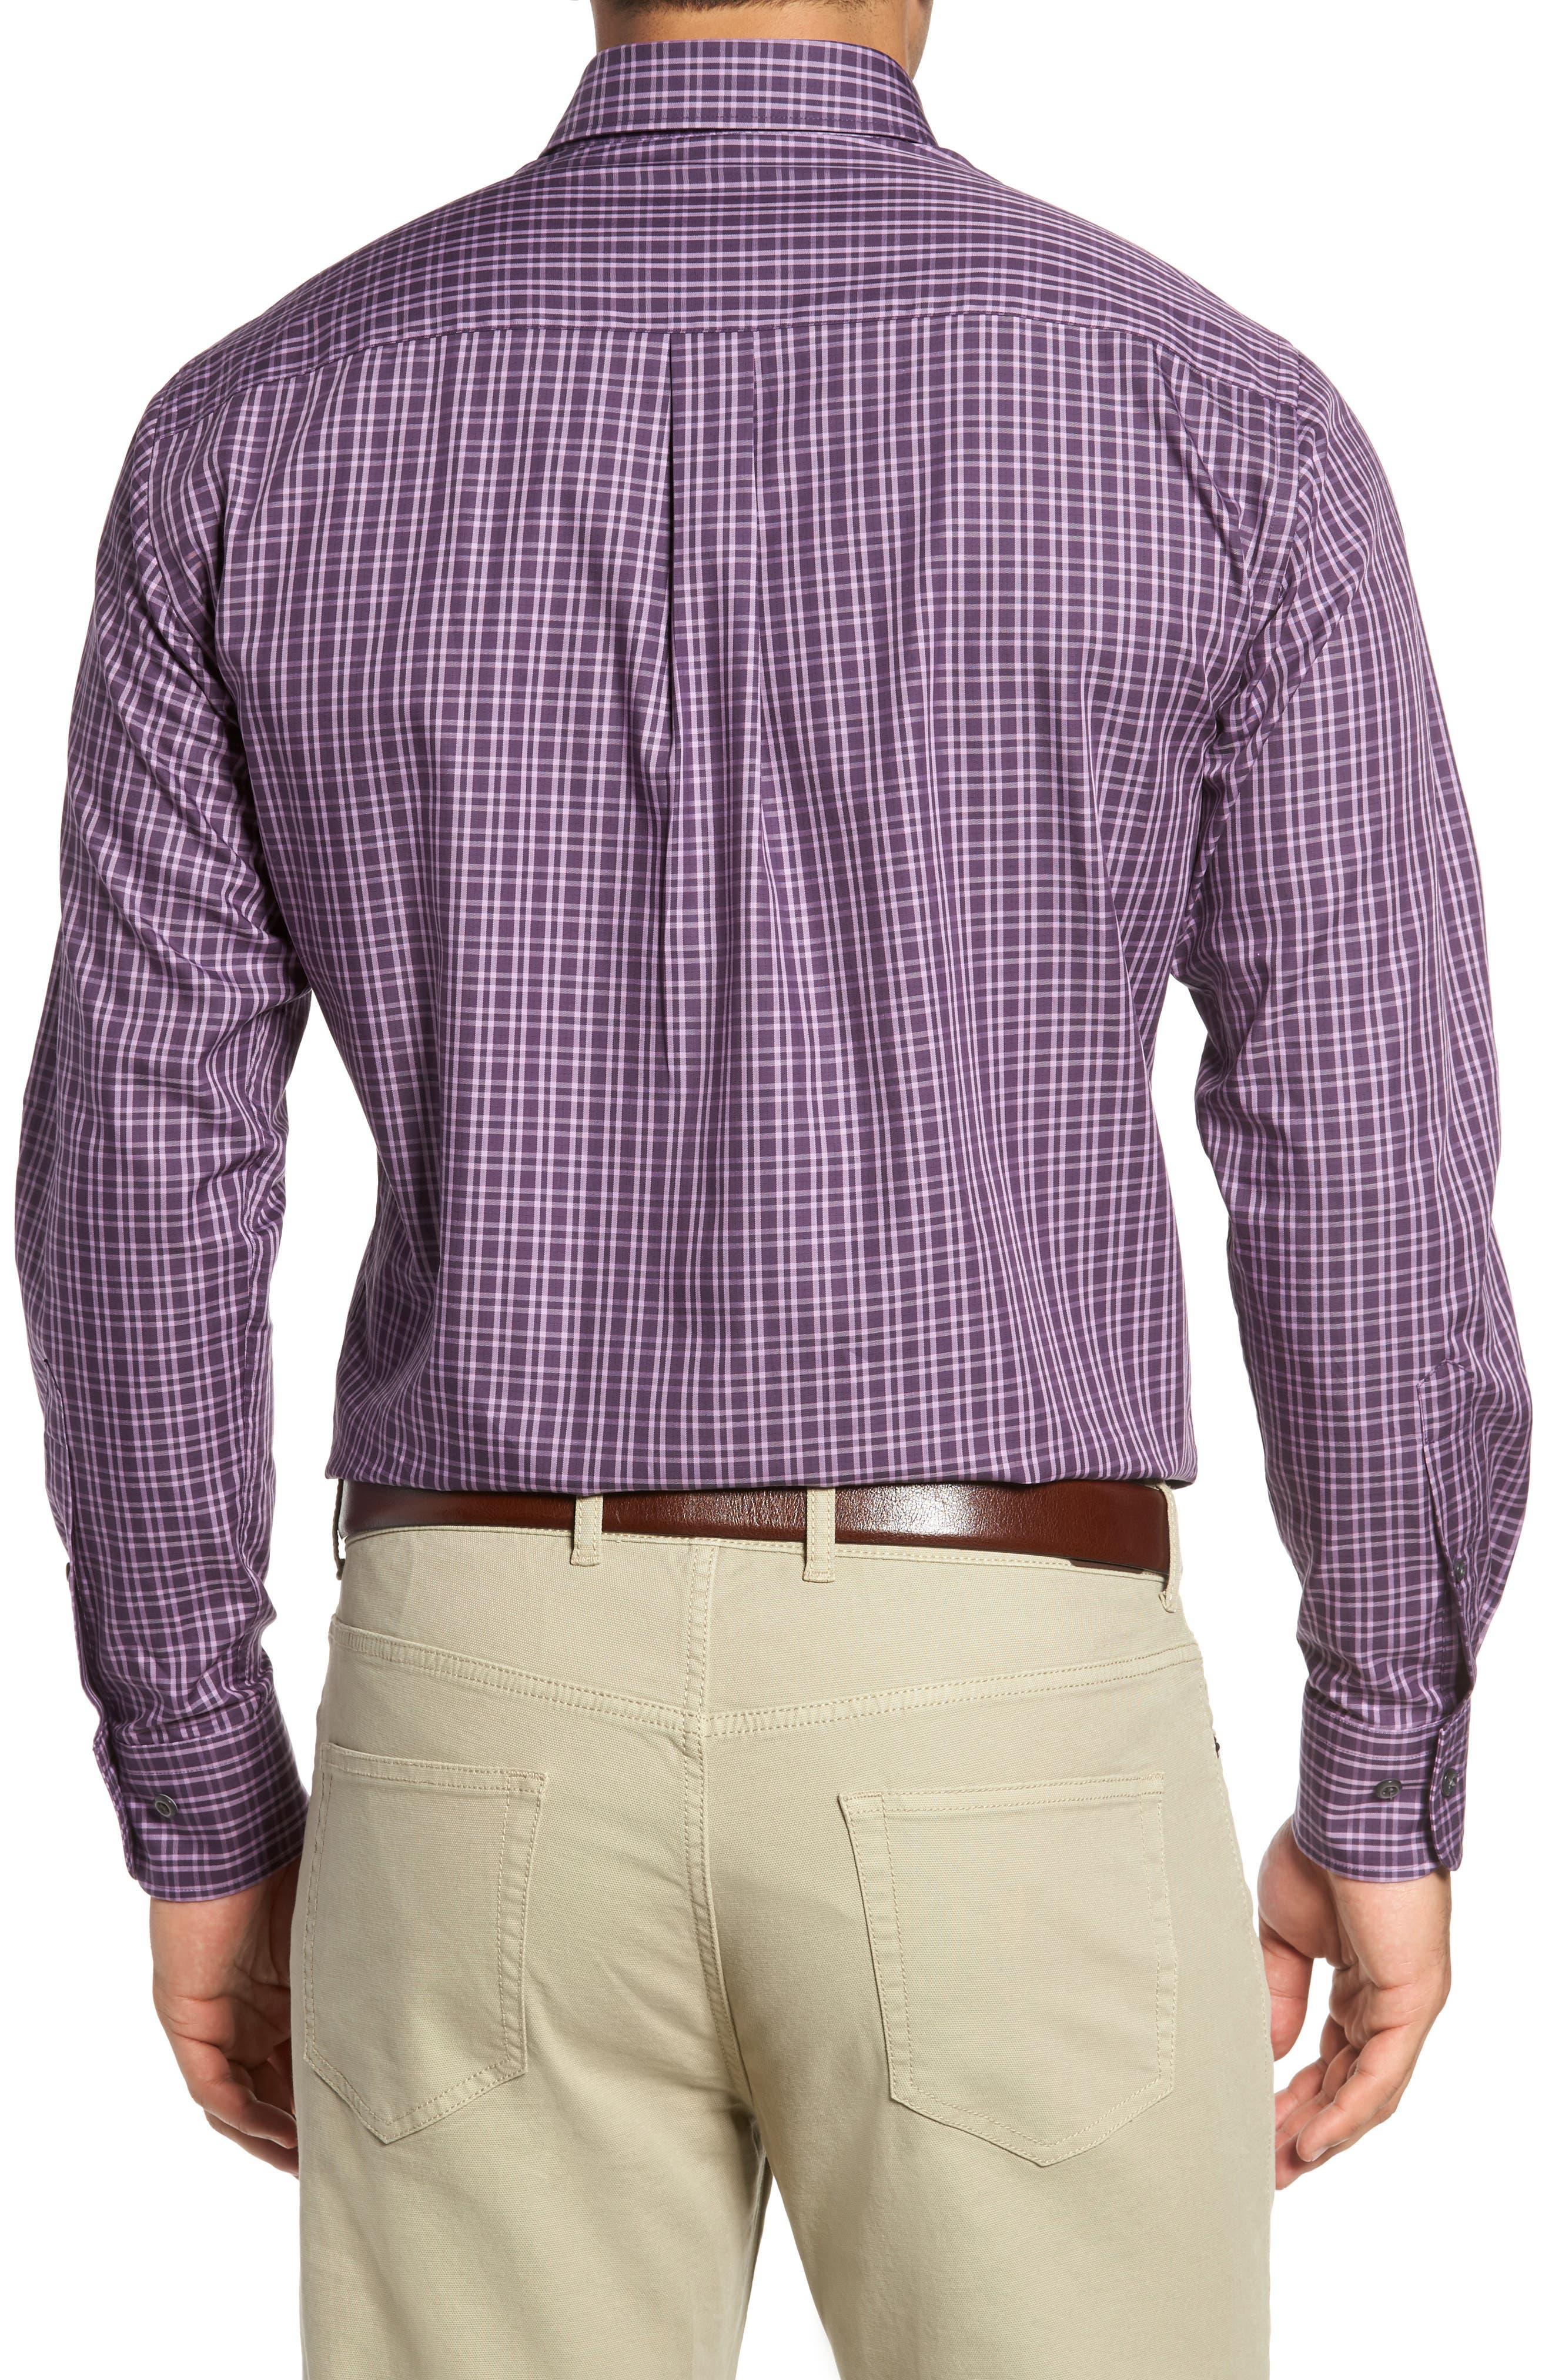 Alternate Image 2  - Peter Millar Autumn Check Regular Fit Sport Shirt